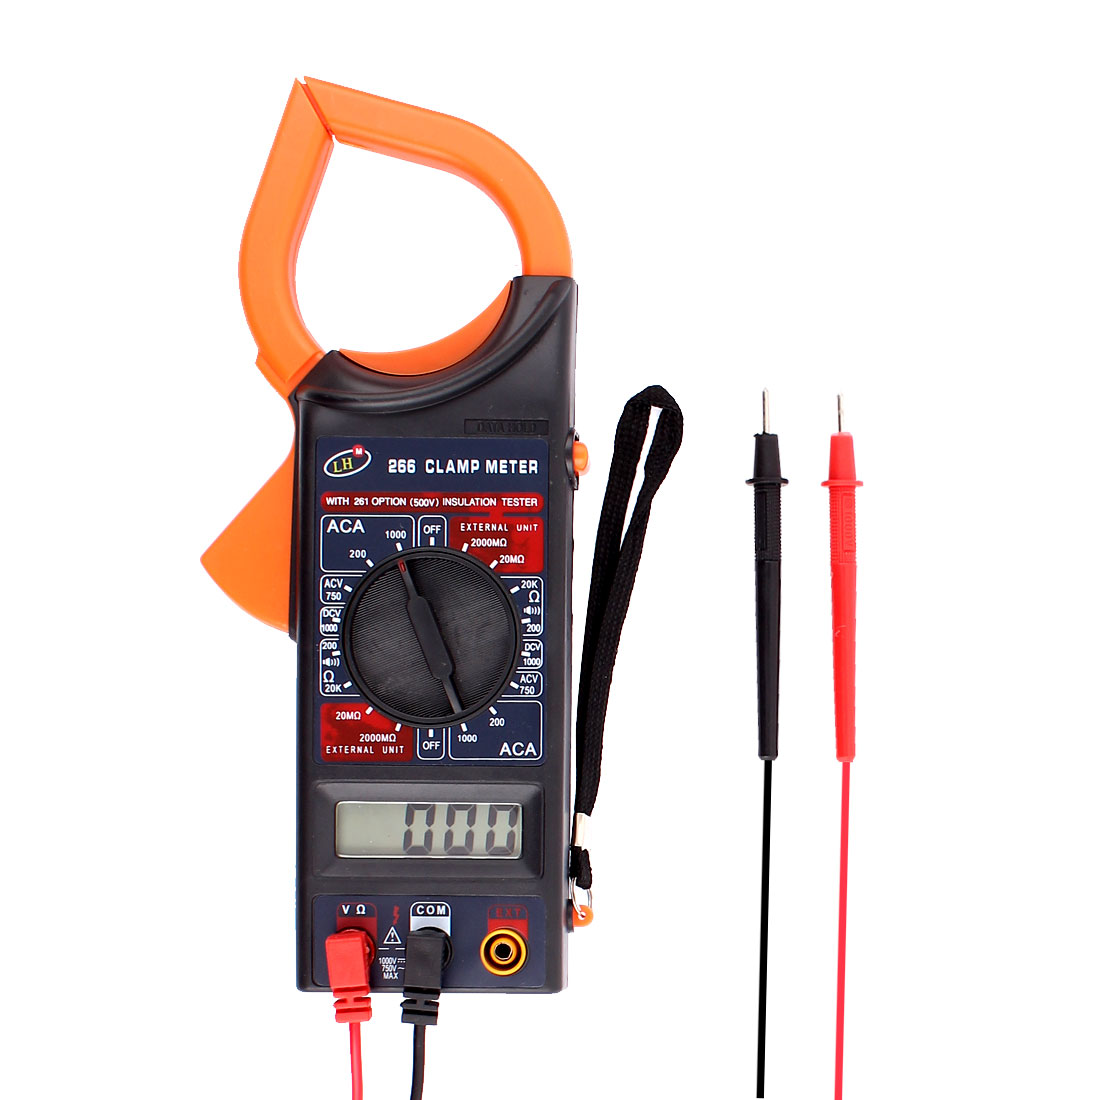 Volt Ohm Meter Multimeter Digital Clamp Meter w Test Probe Leads Red Black